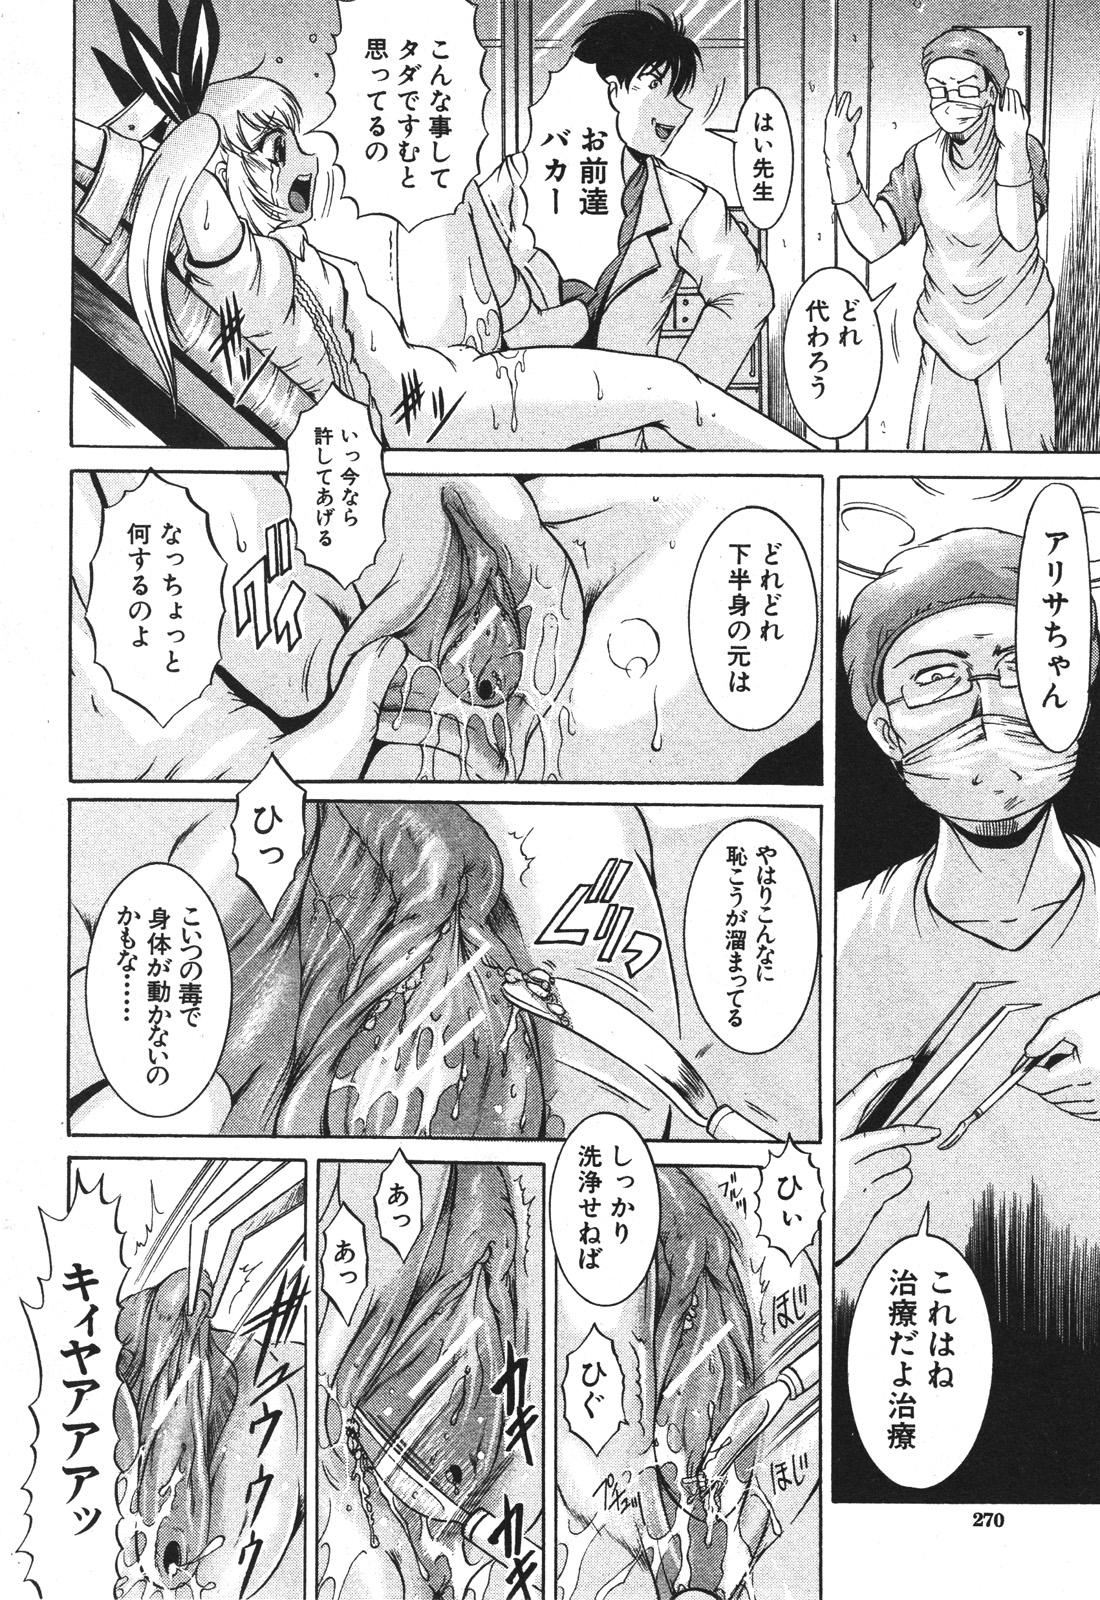 BUSTER COMIC 2010-05 Vol.07 268